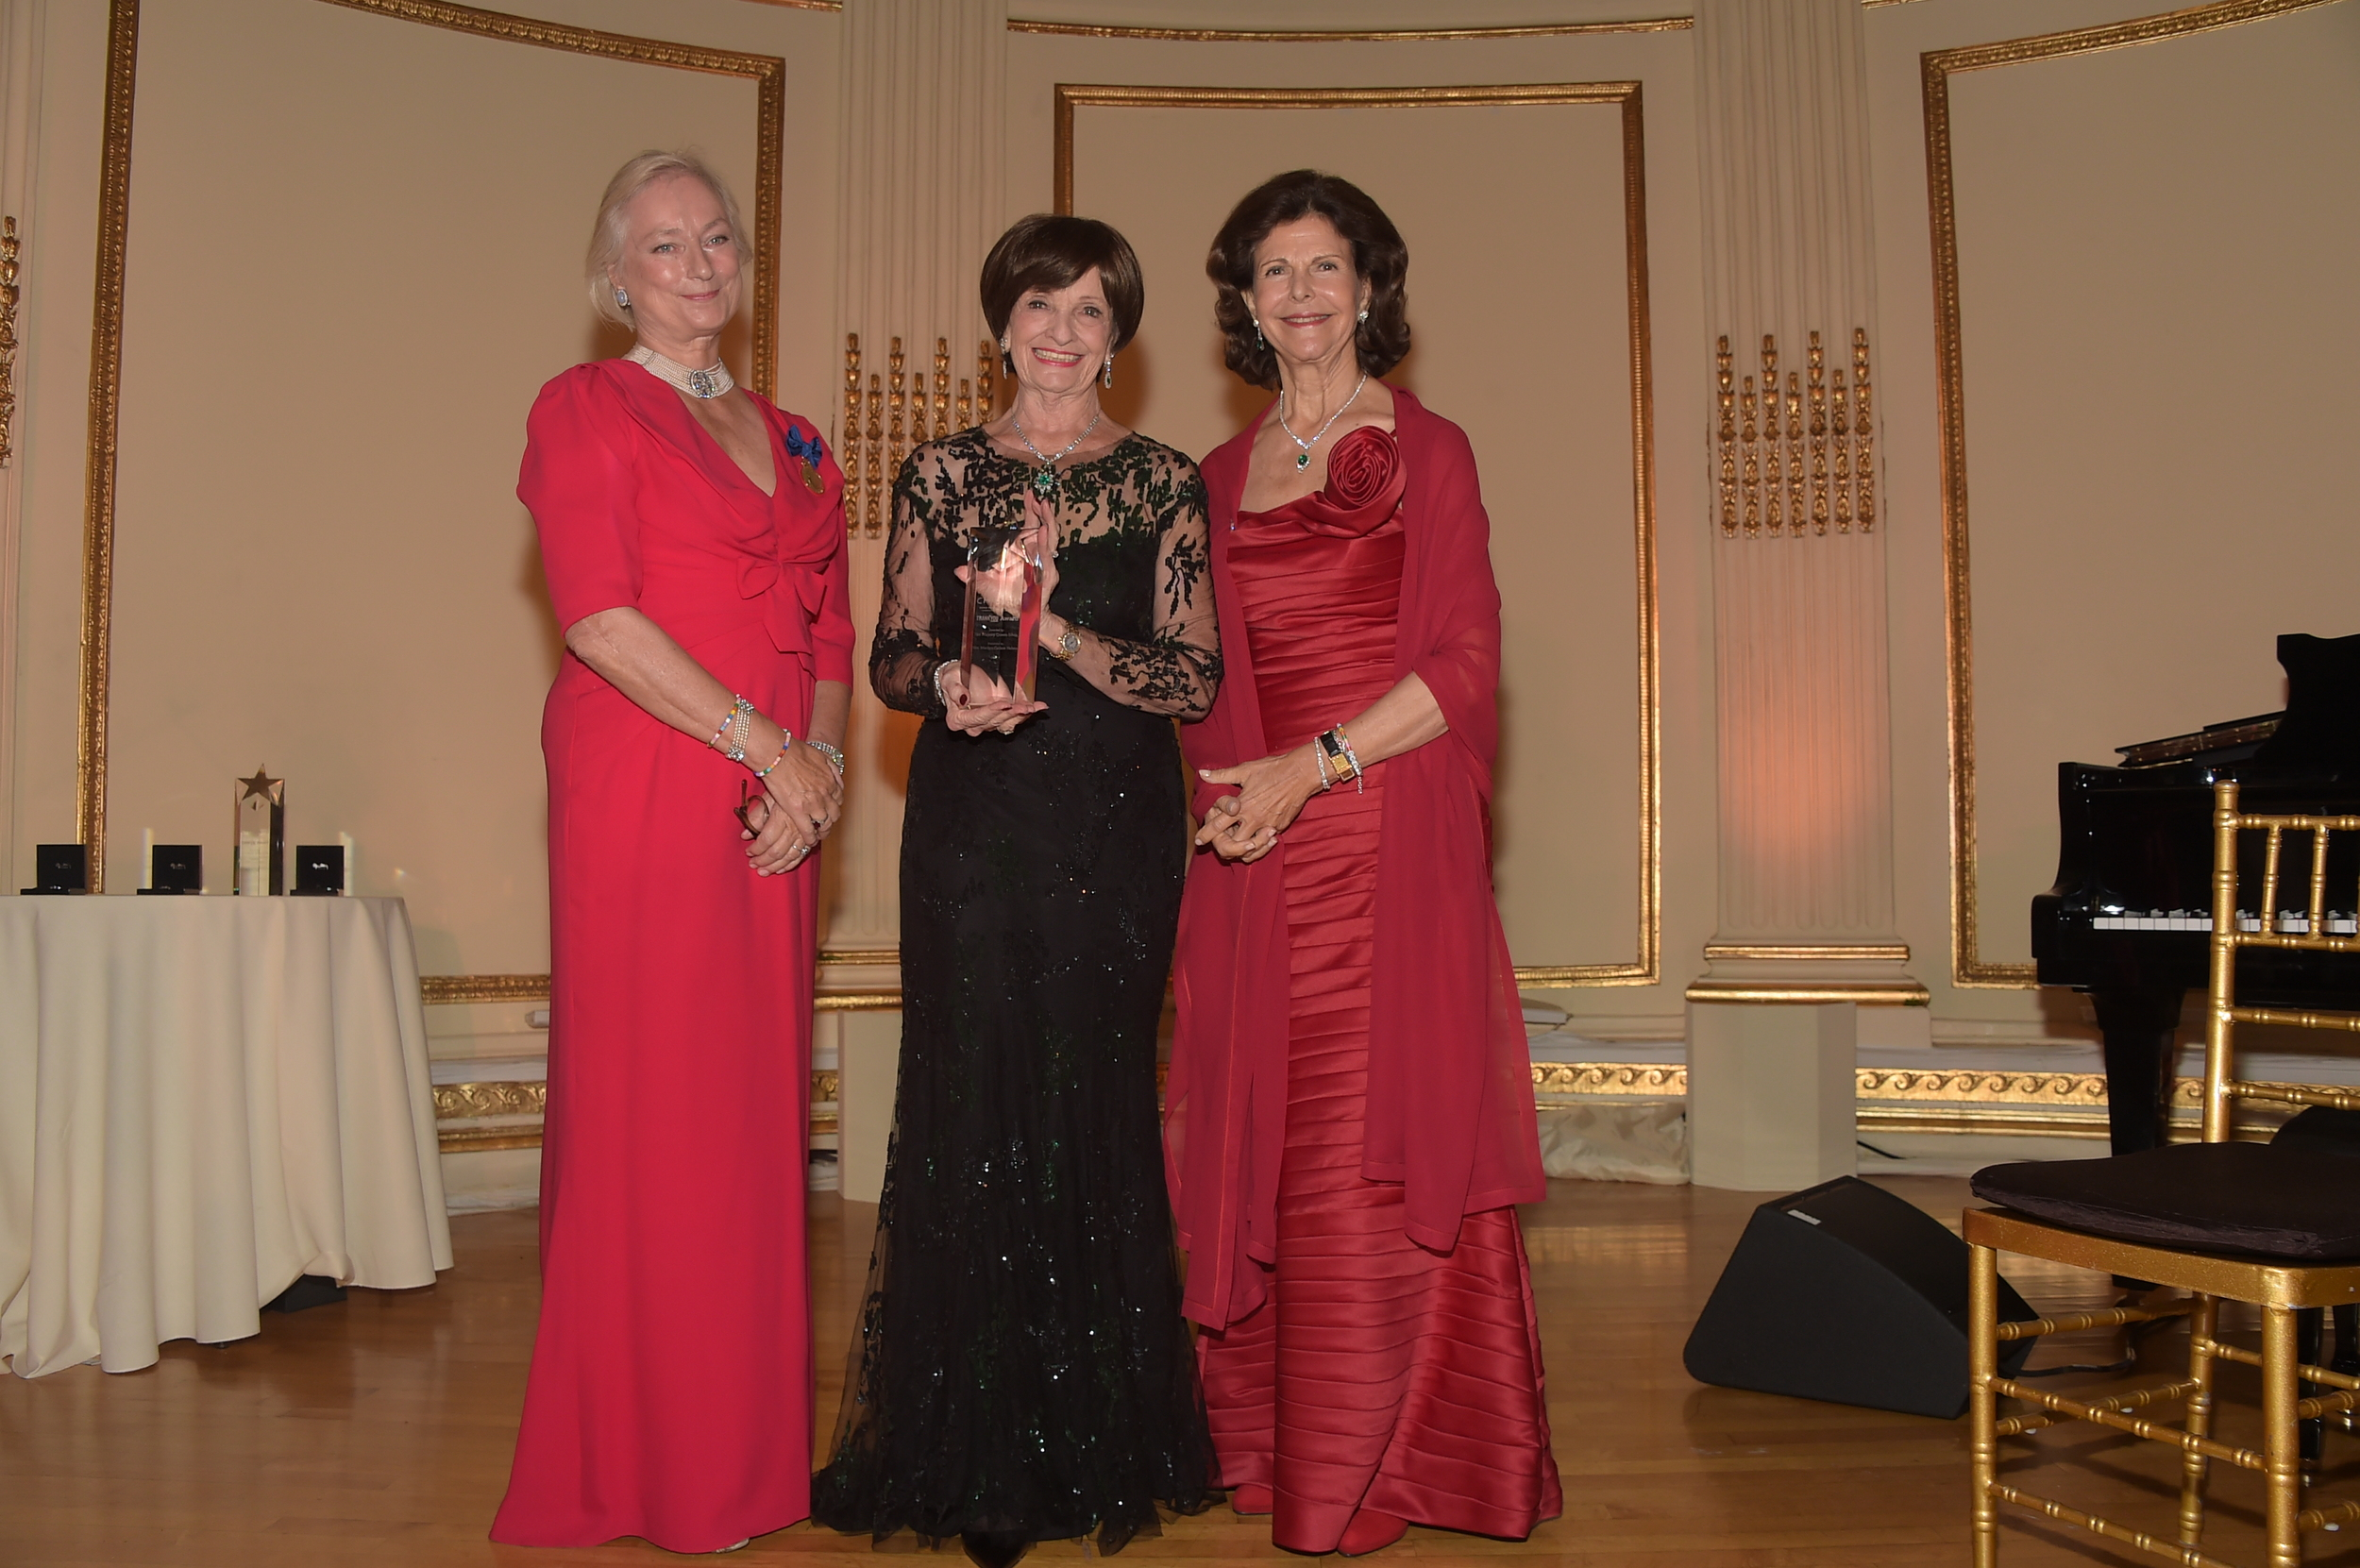 HM Queen Silvia, Marilyn Carlson Nelson (C), Lena Kaplan (R)